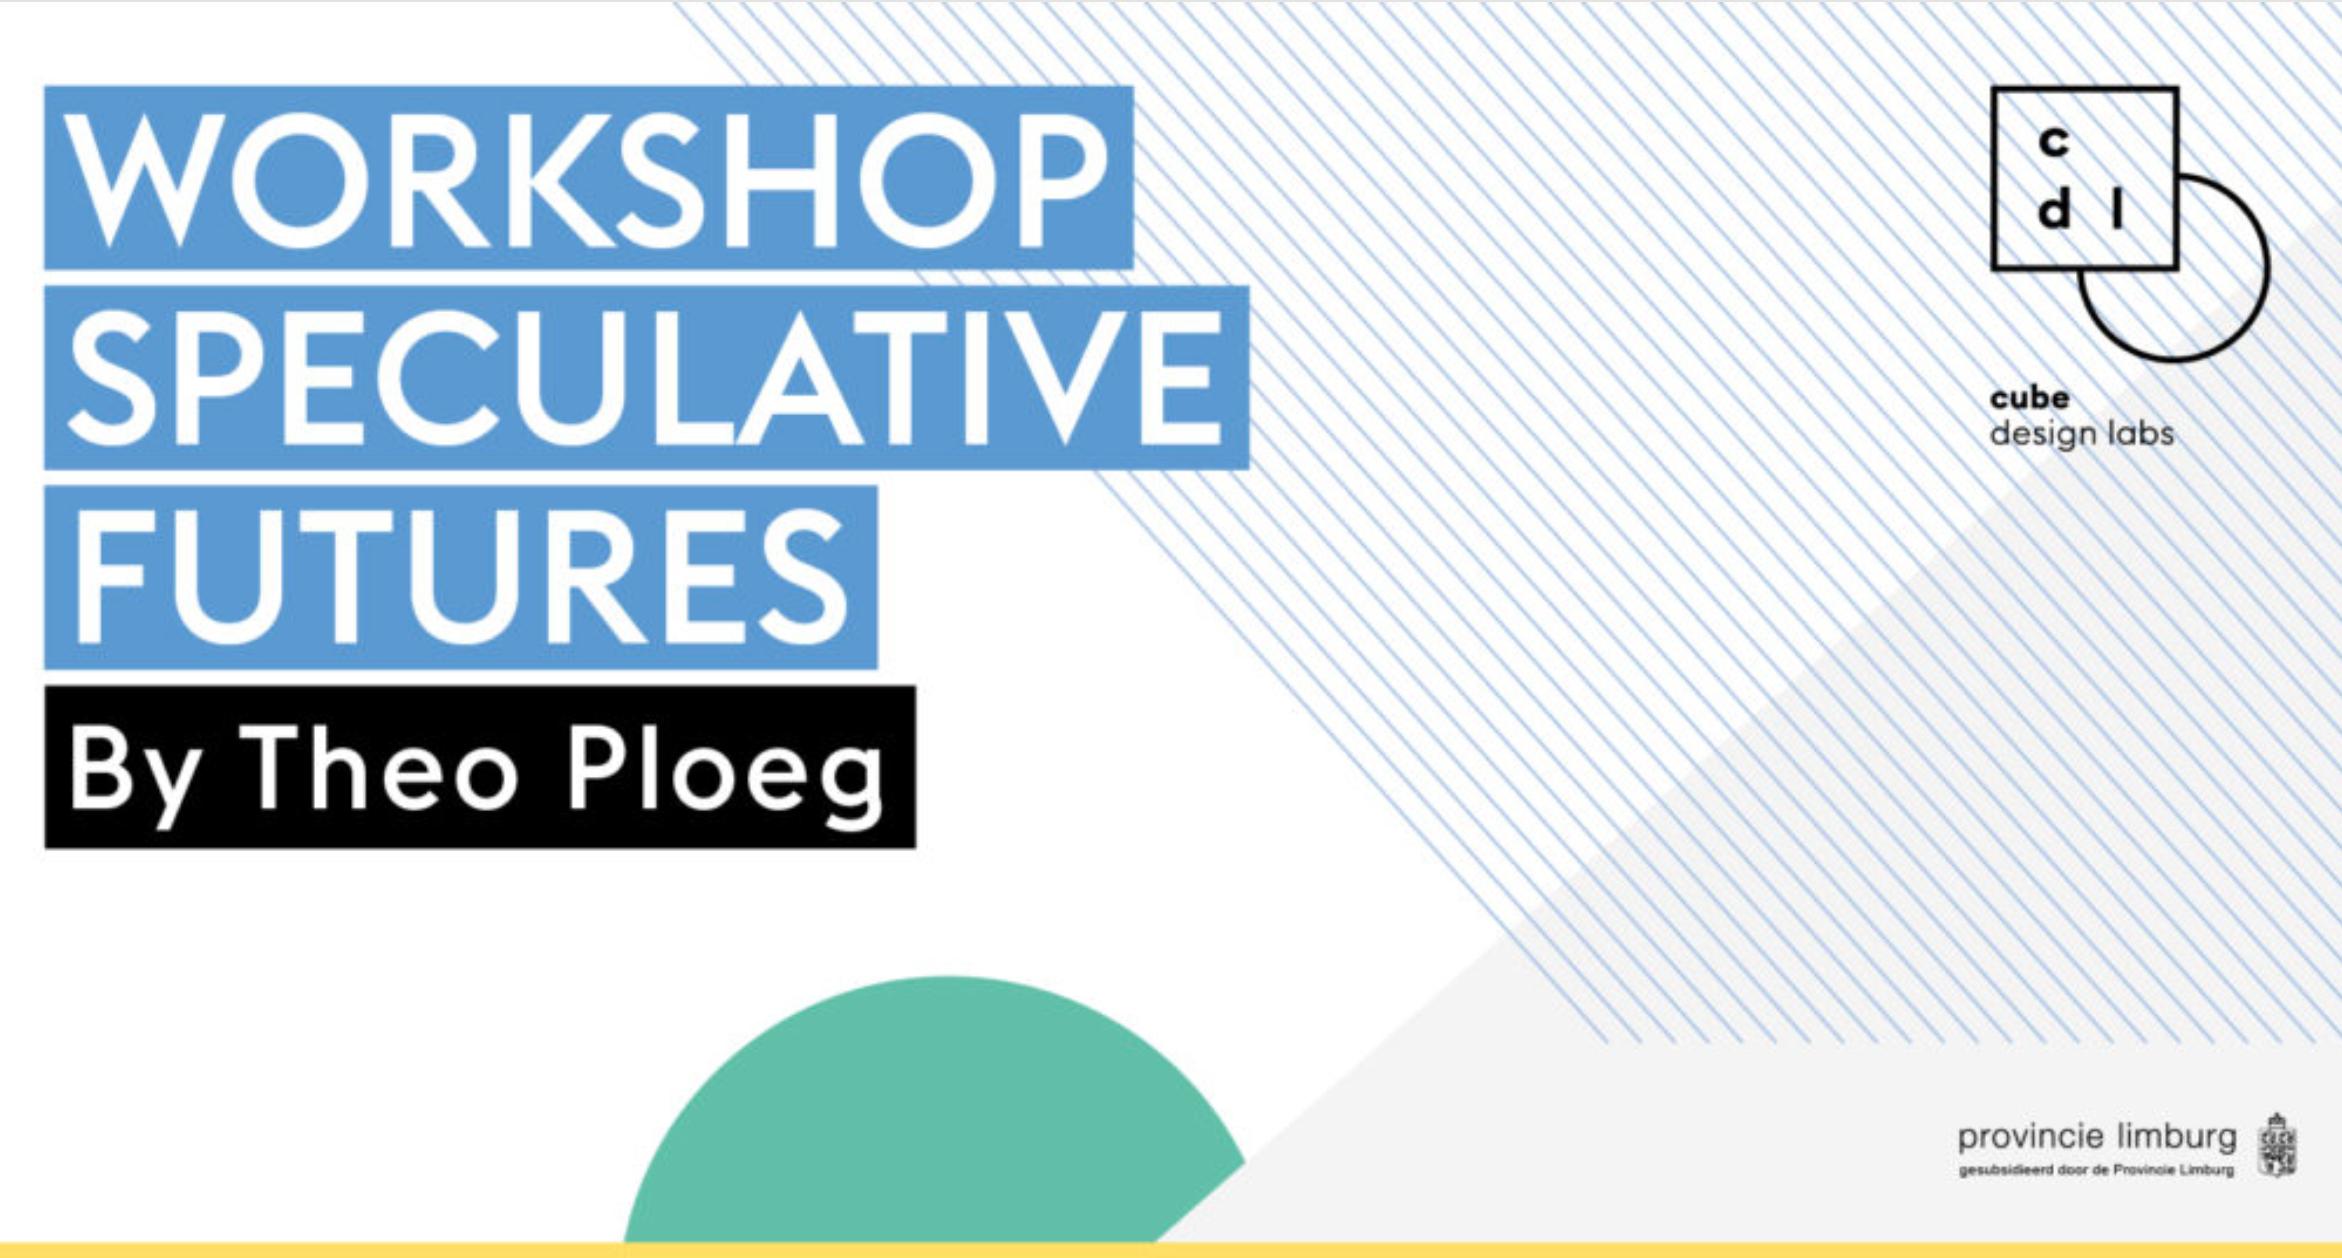 workshop speculative futures